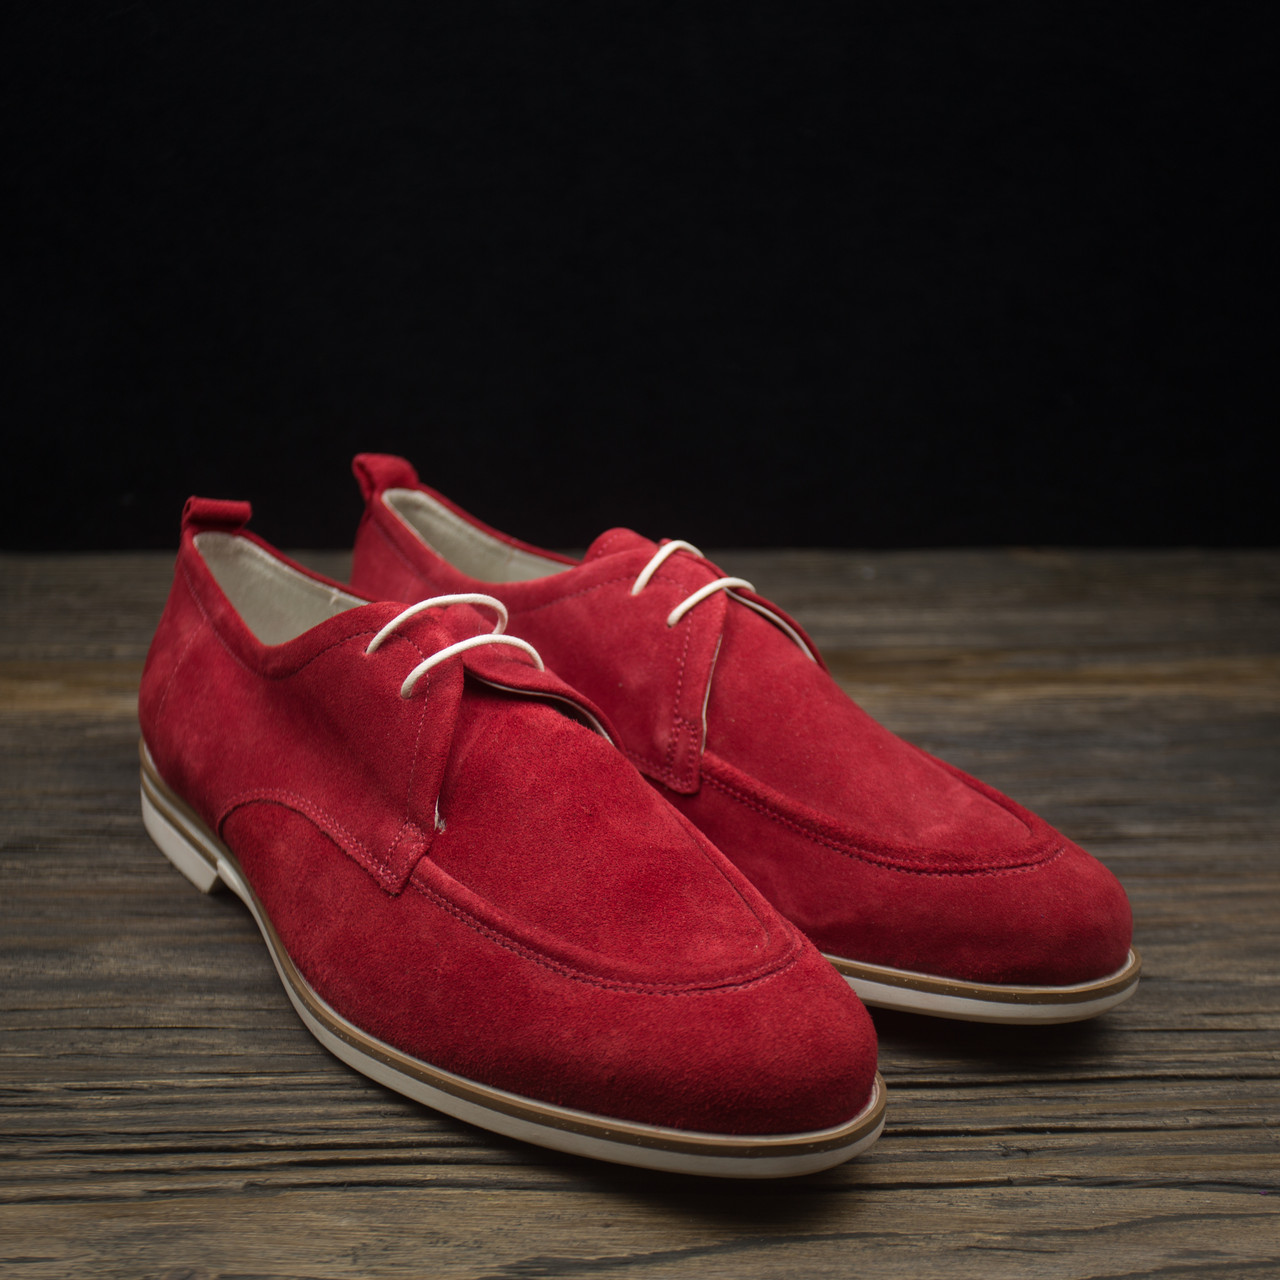 Мужские туфли San Marina р-45